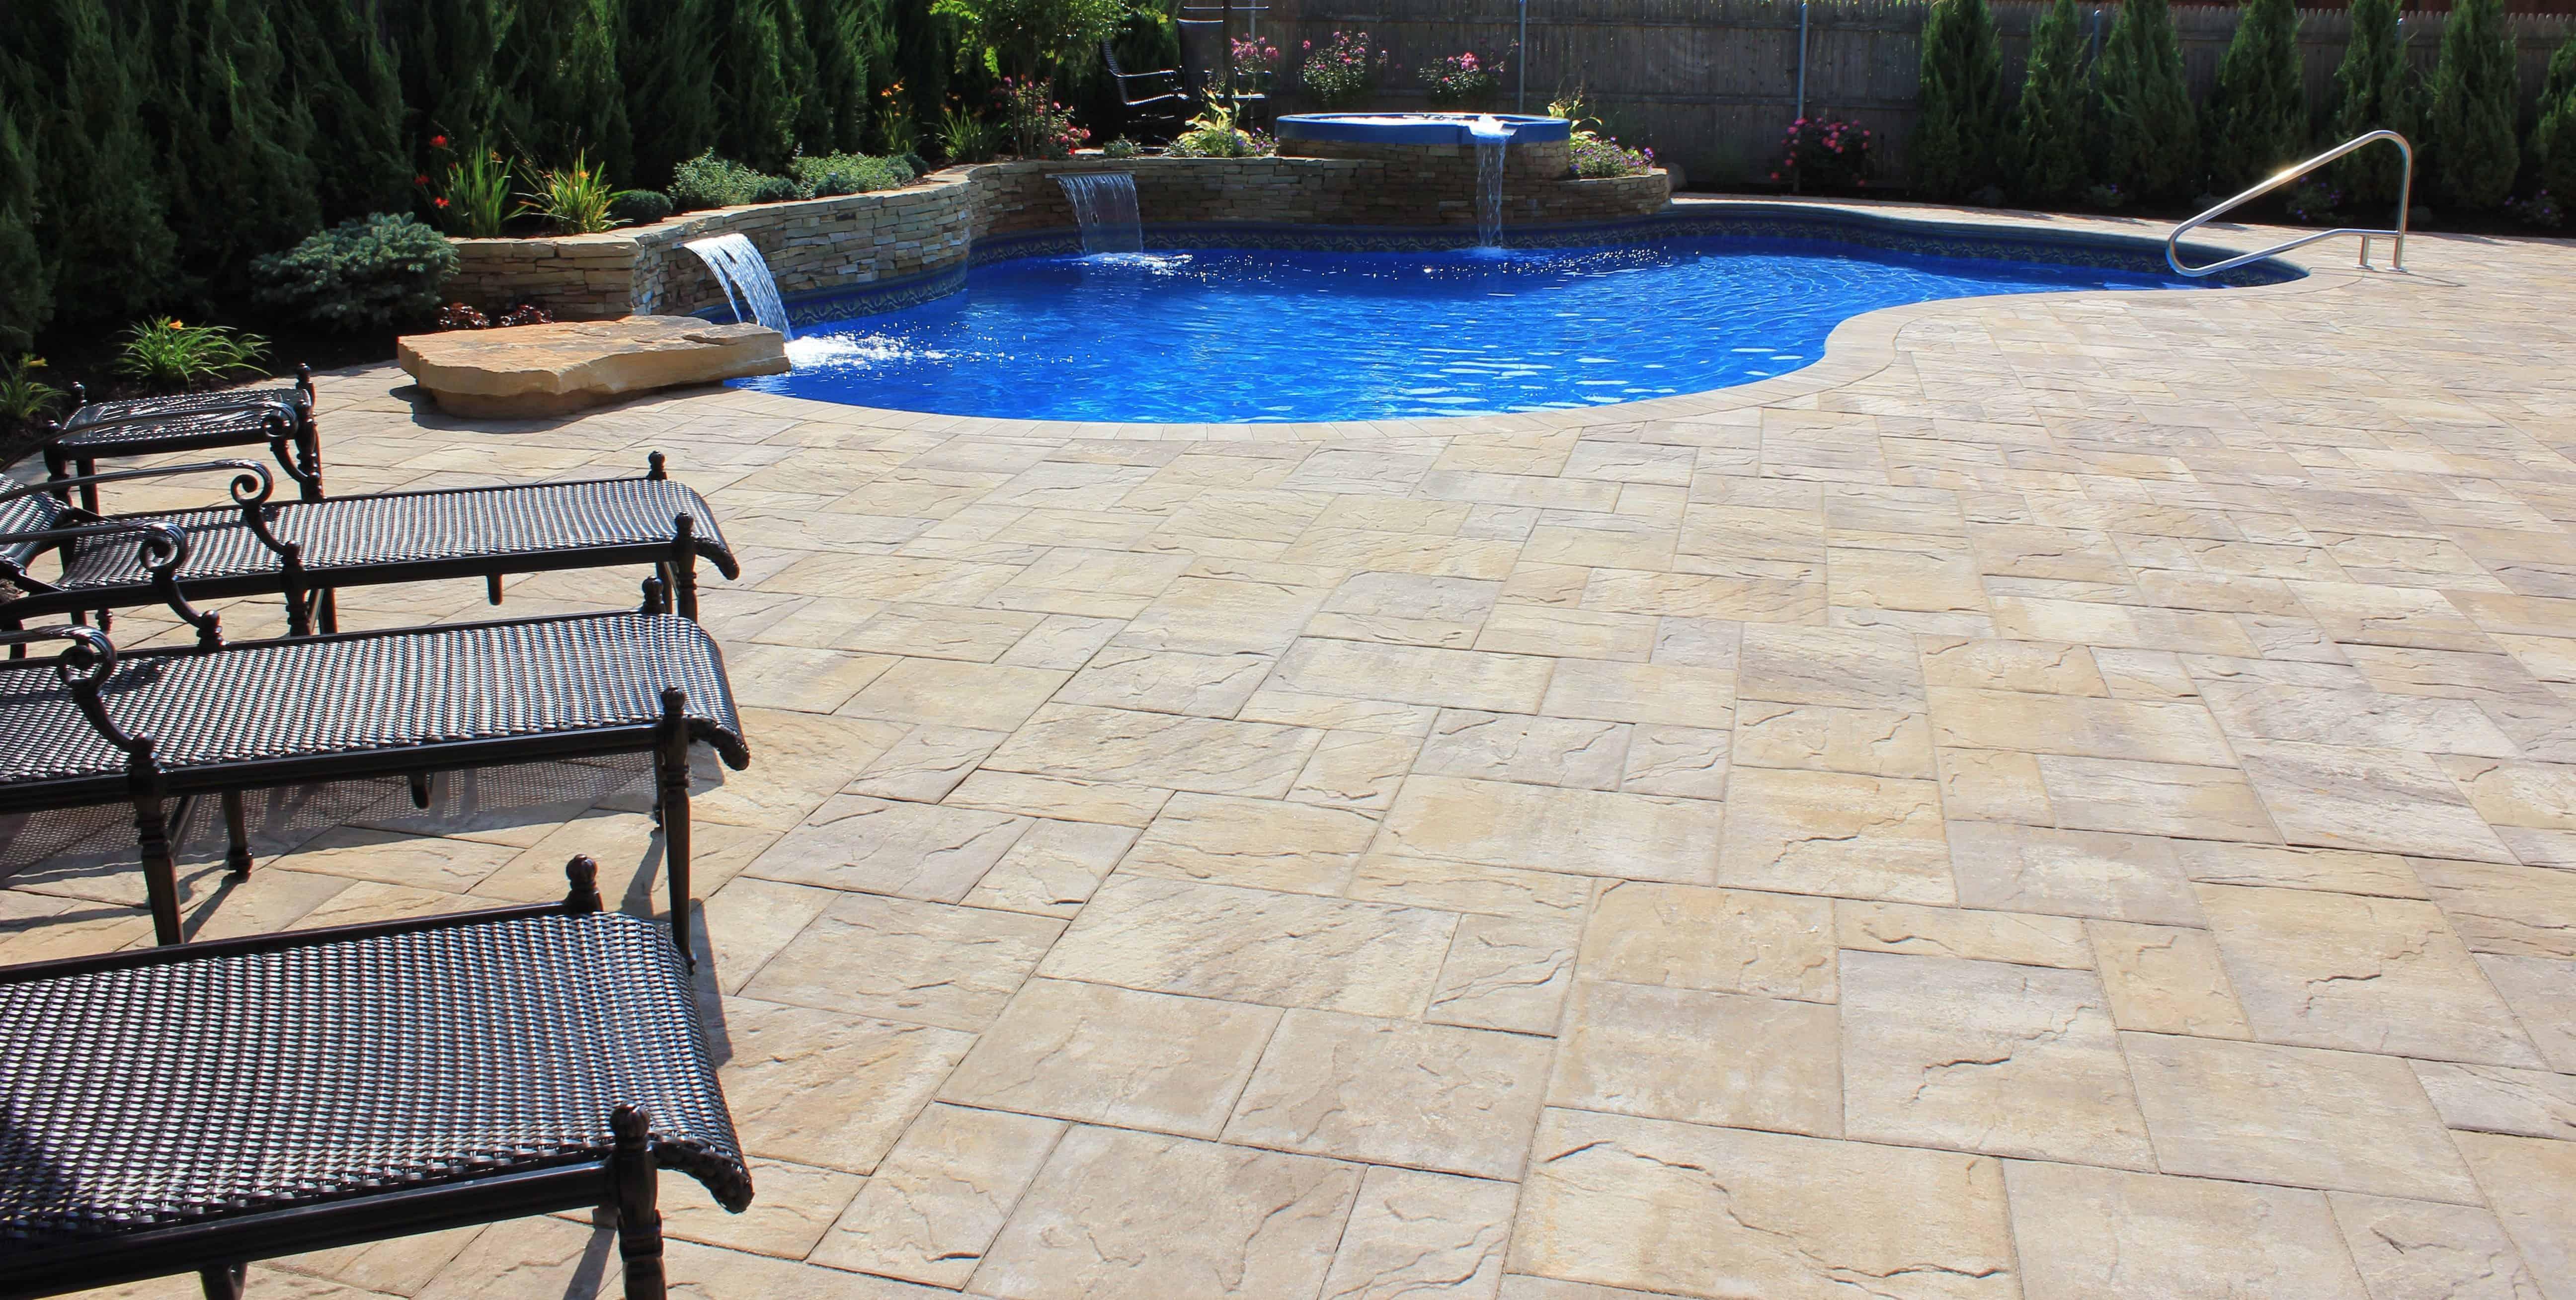 Cambridge Ledgestone XL - Sahara Chestnut Lite - Paver Pool Patio  - Merrick, Long Island NY